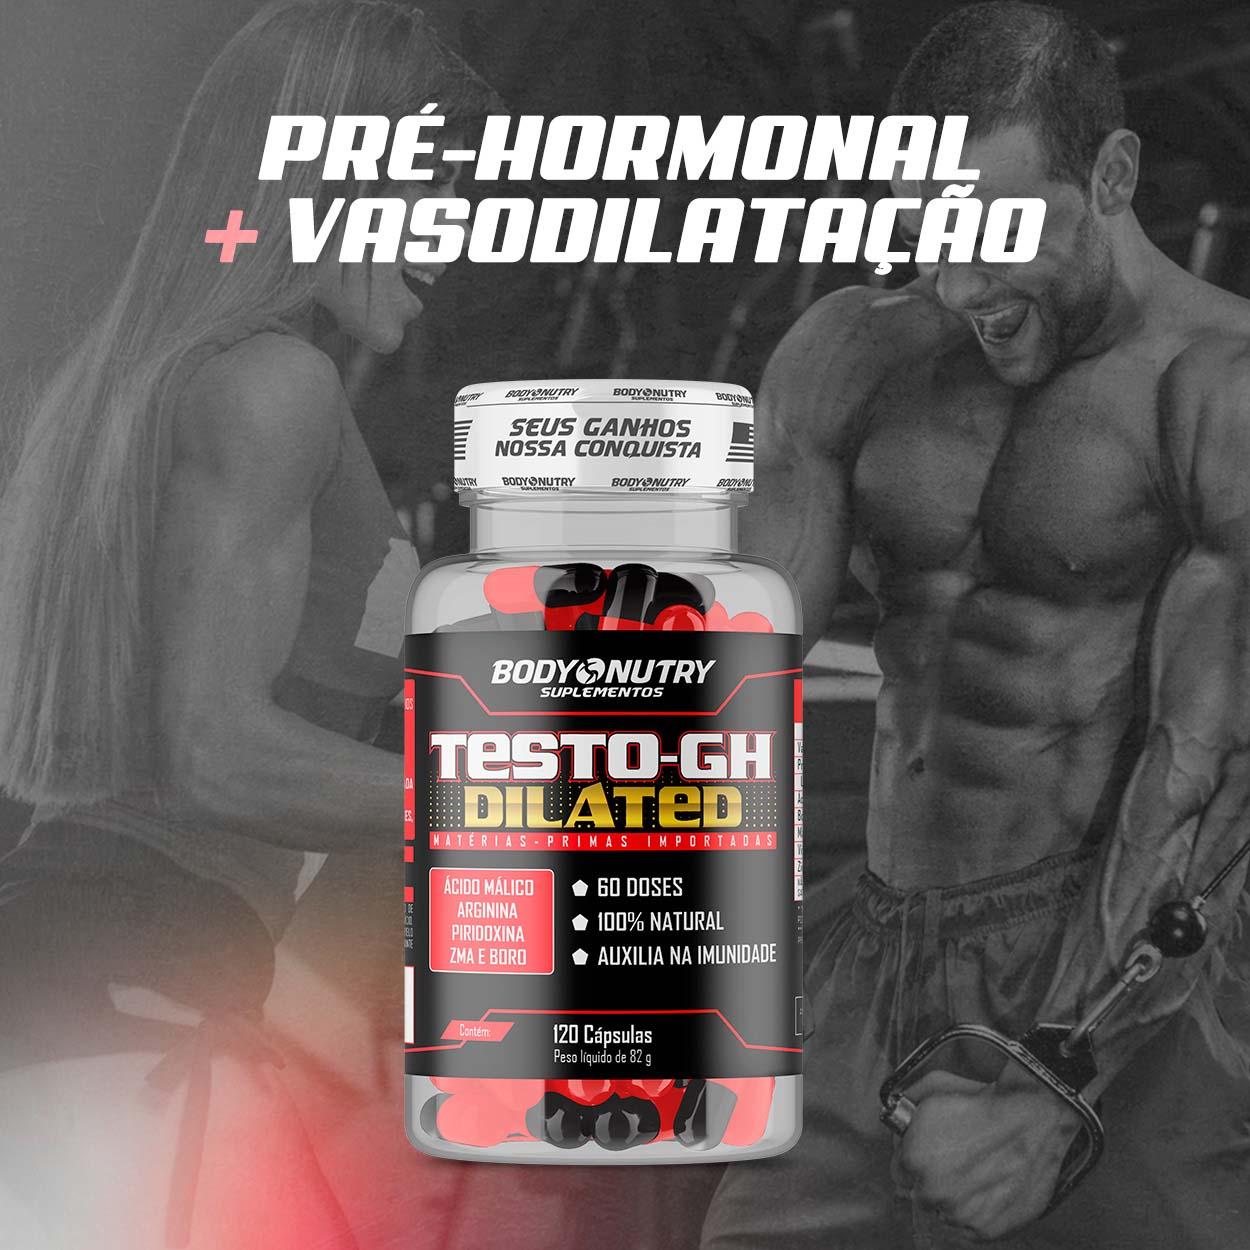 Testo-GH Dilated